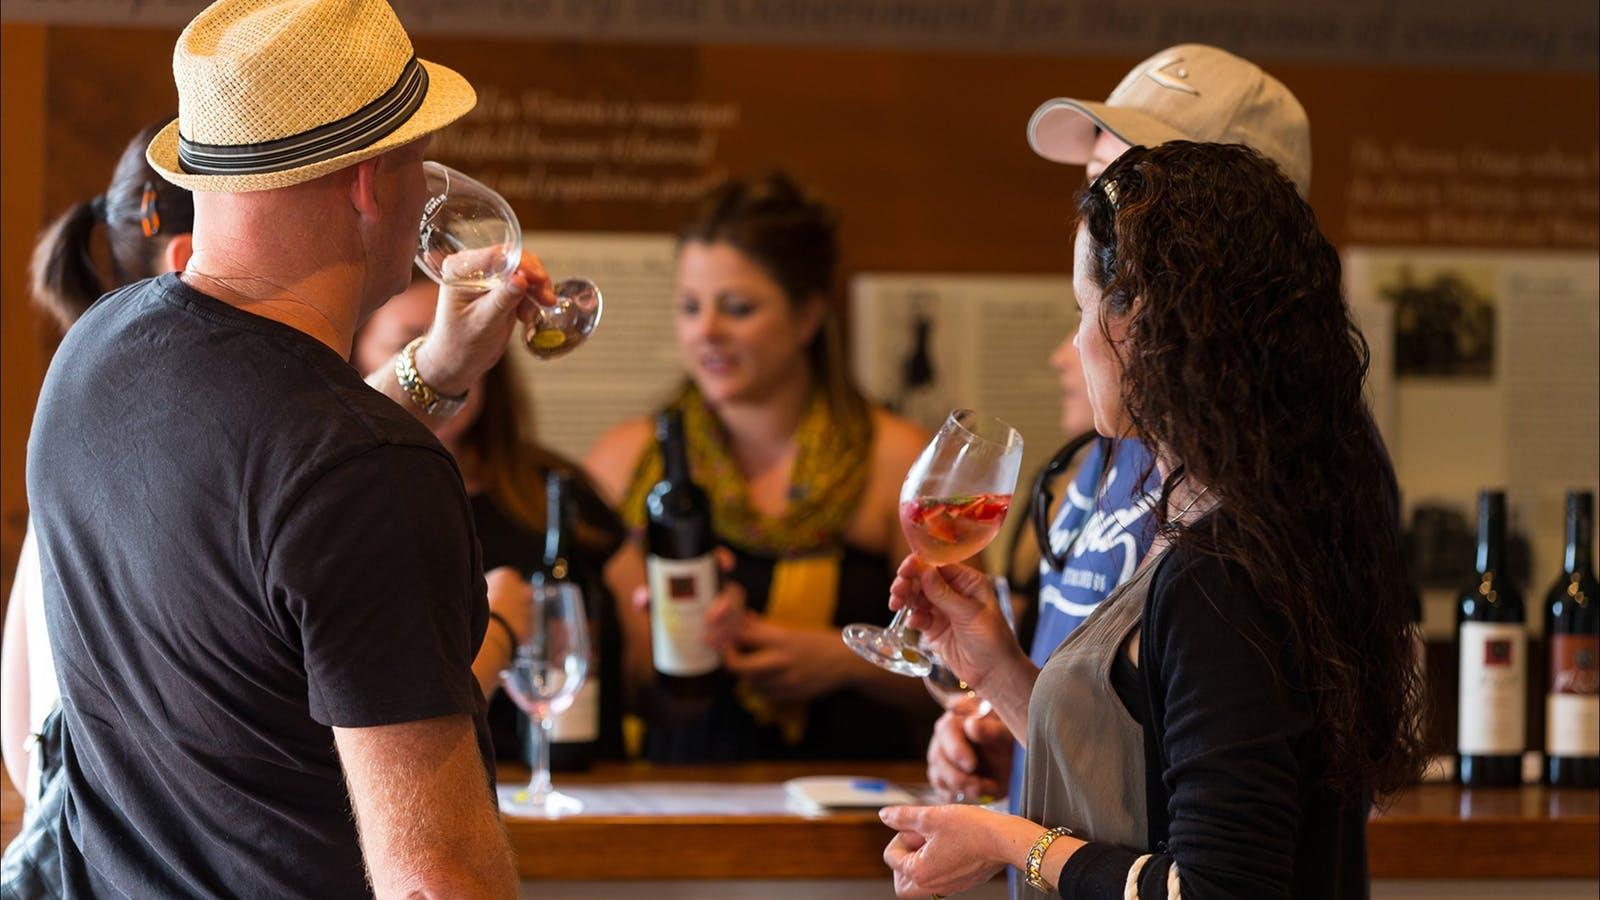 Wine Tasting at Cellar Door